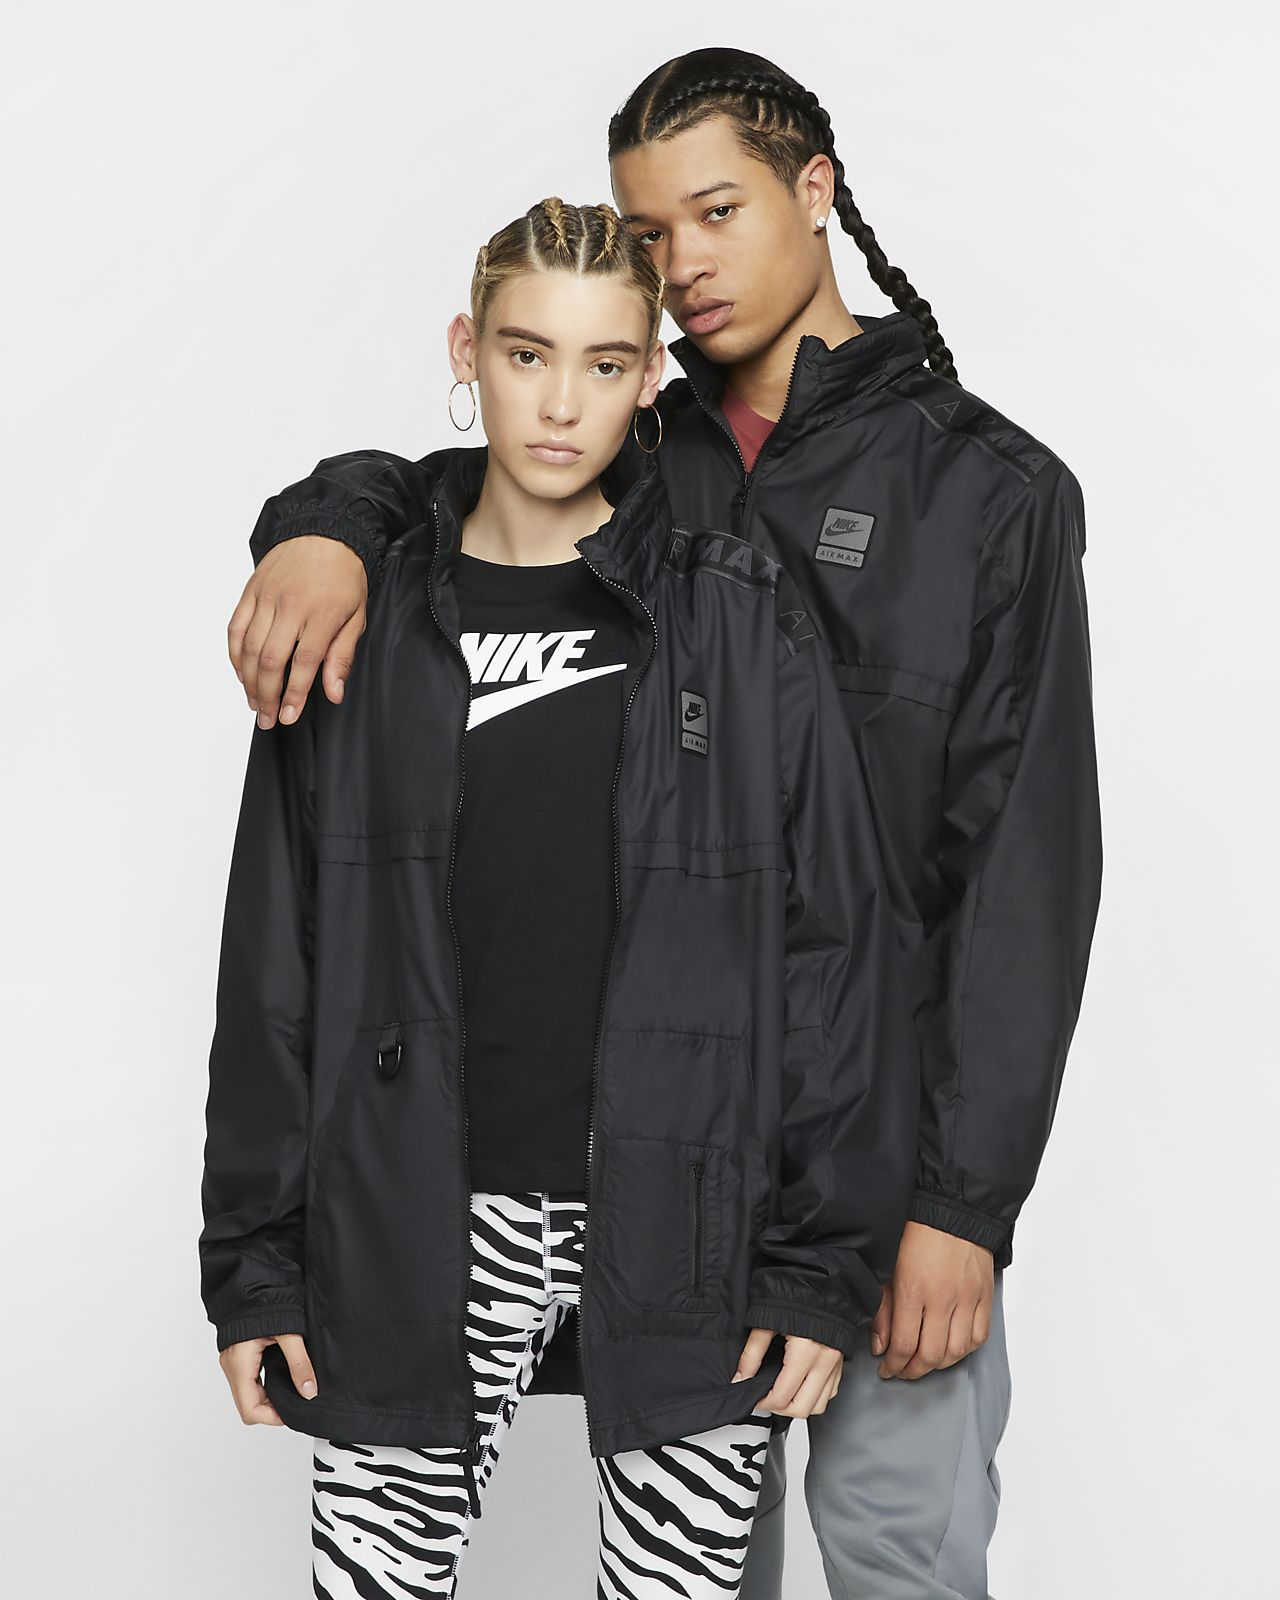 95f47952d3d Nike Sportswear Air Max – vævet jakke til mænd. Nike.com DK